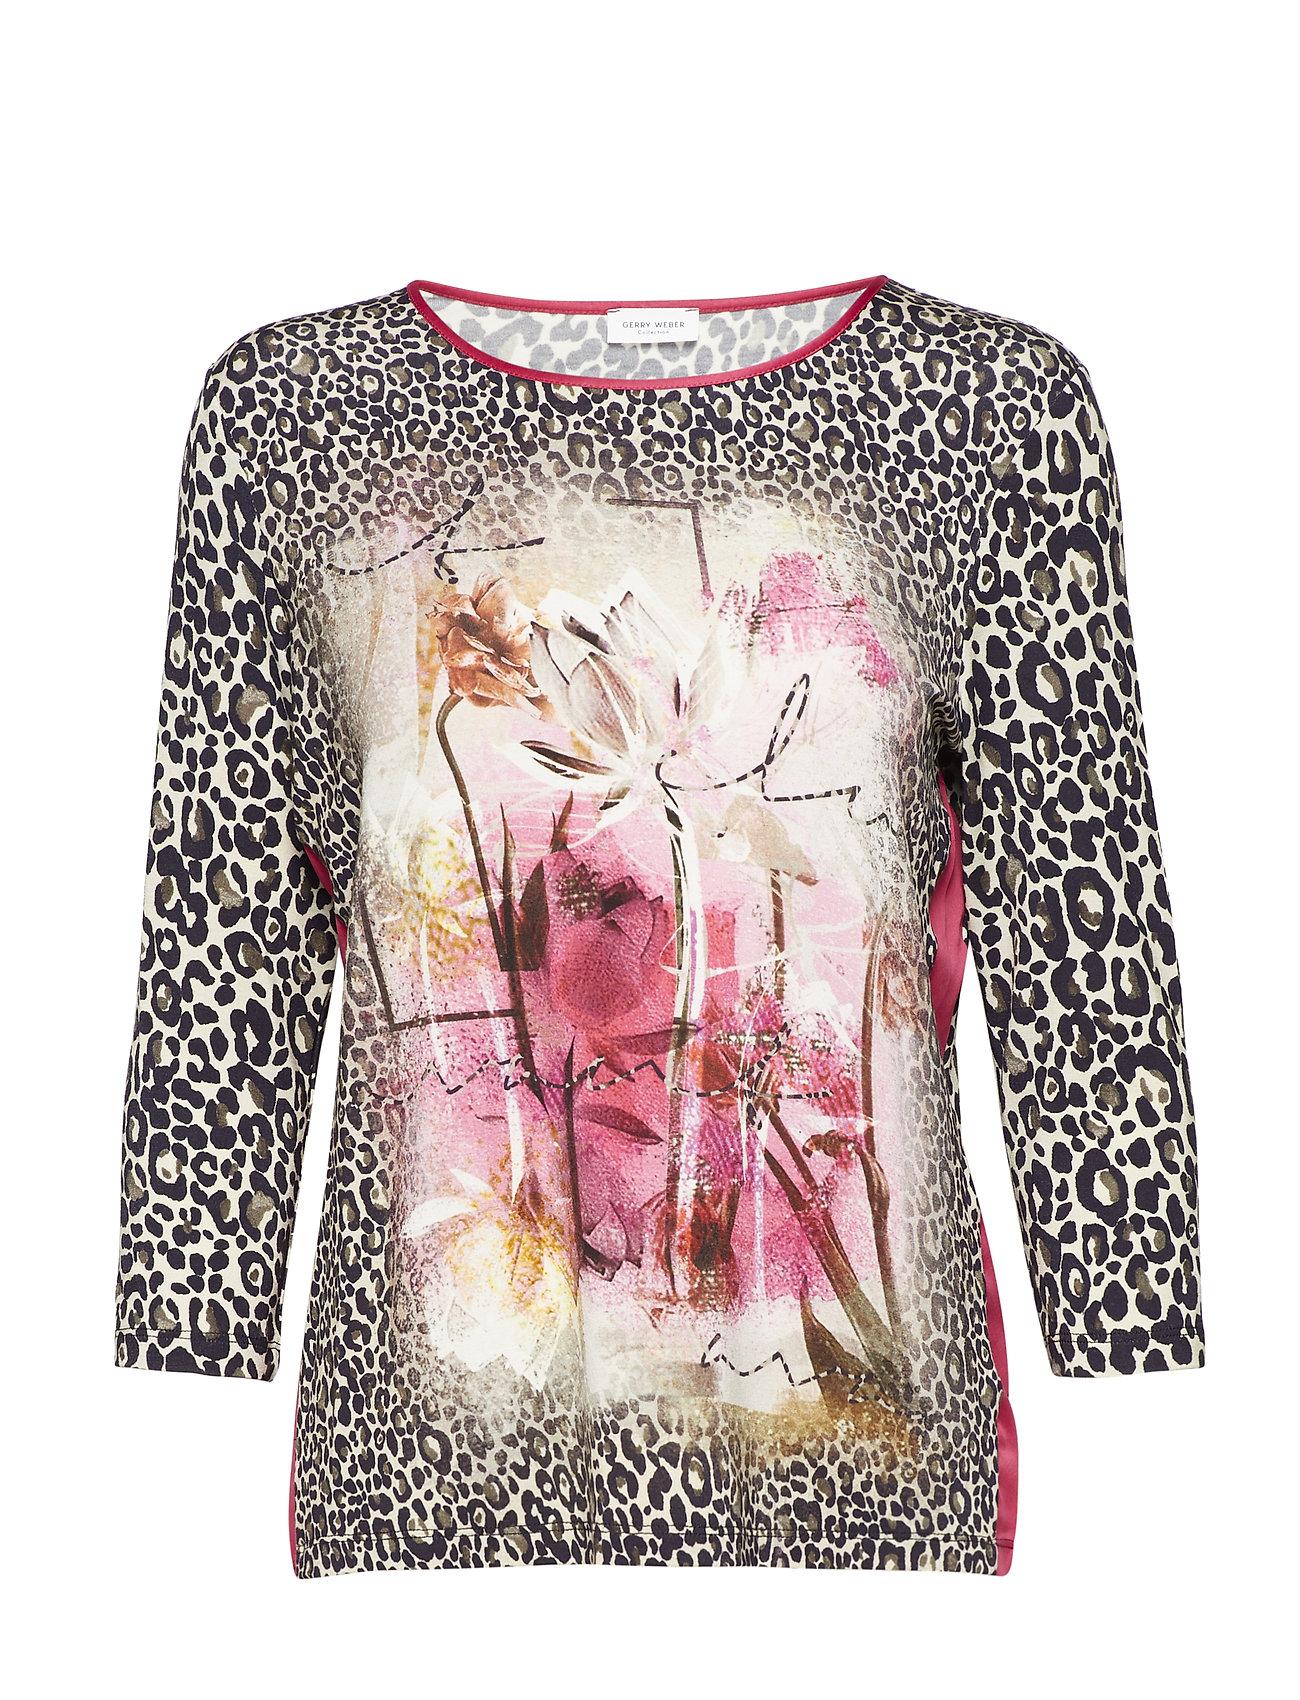 Image of T-Shirt 3/4-Sleeve R Langærmet T-shirt Multi/mønstret GERRY WEBER (3067487311)